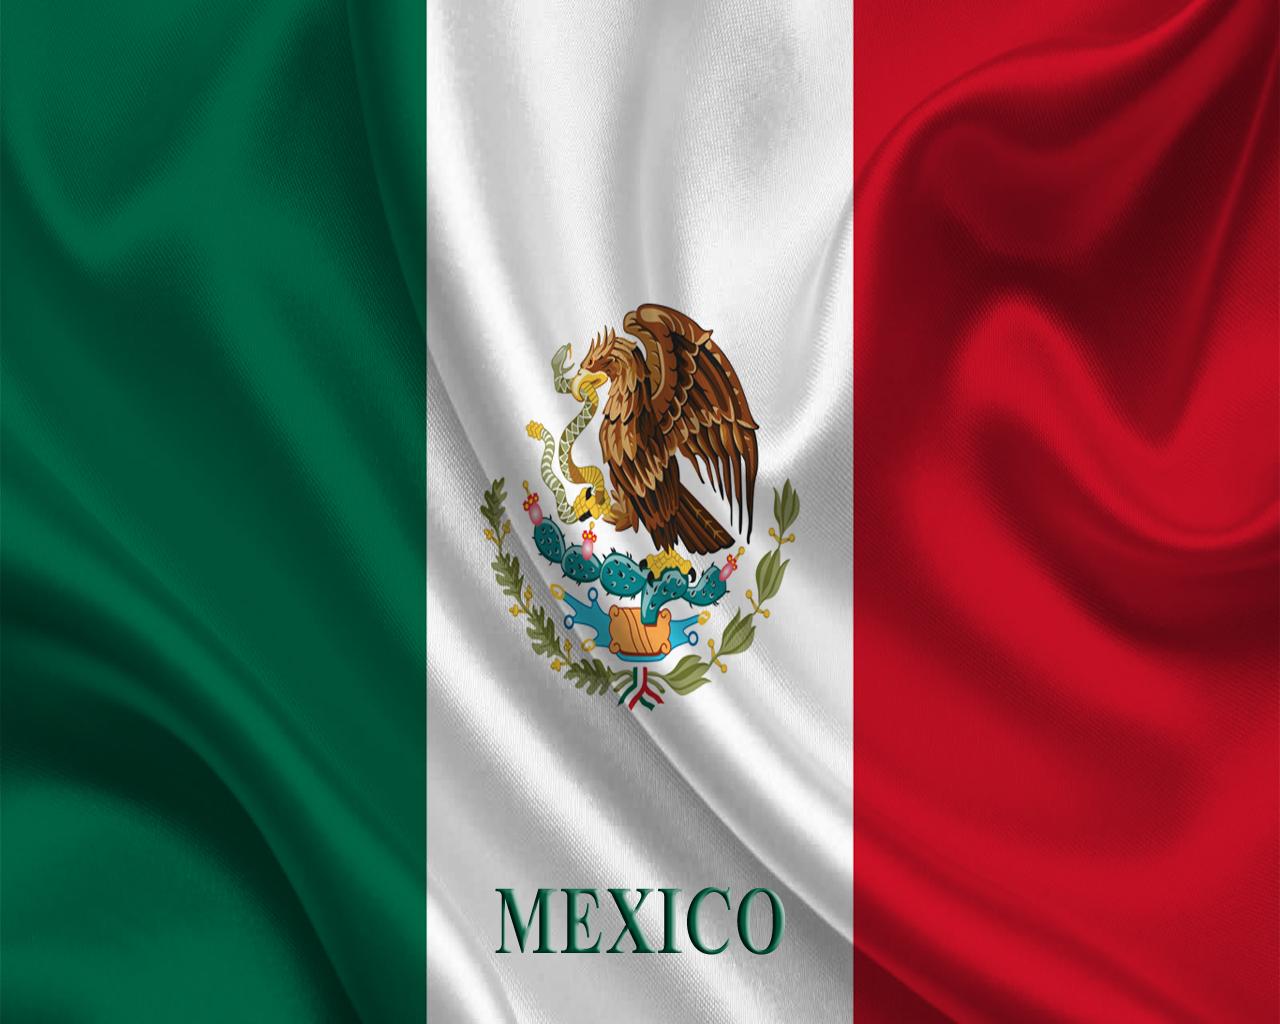 mexico desktop 1280x1024 wallpaper Football Pictures and Photos 1280x1024